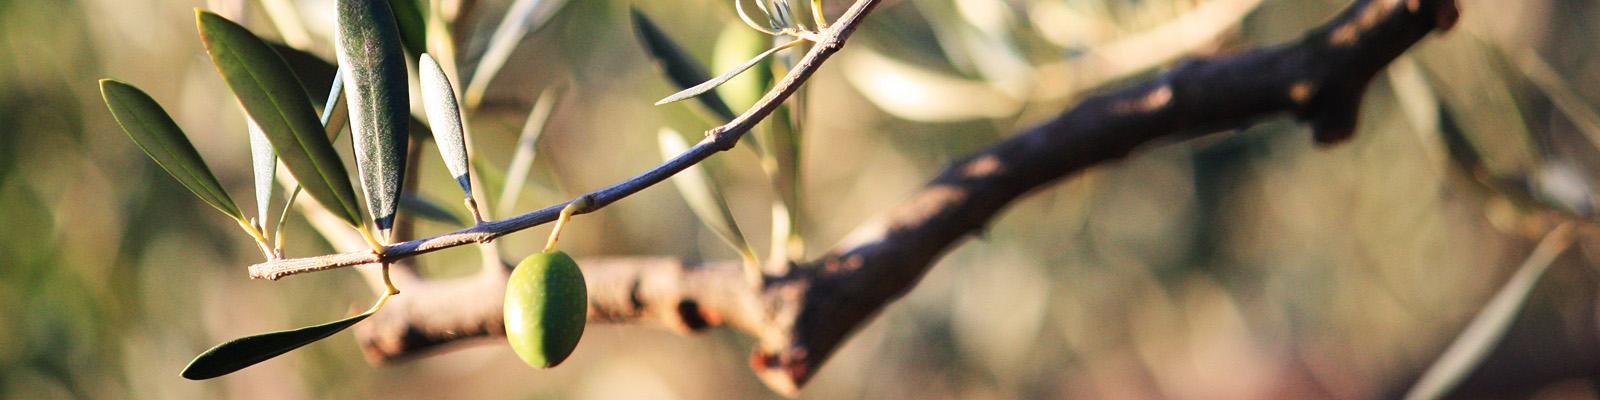 Green Parrot Gardens | Ask the Garden Consultants | Pruned Olive